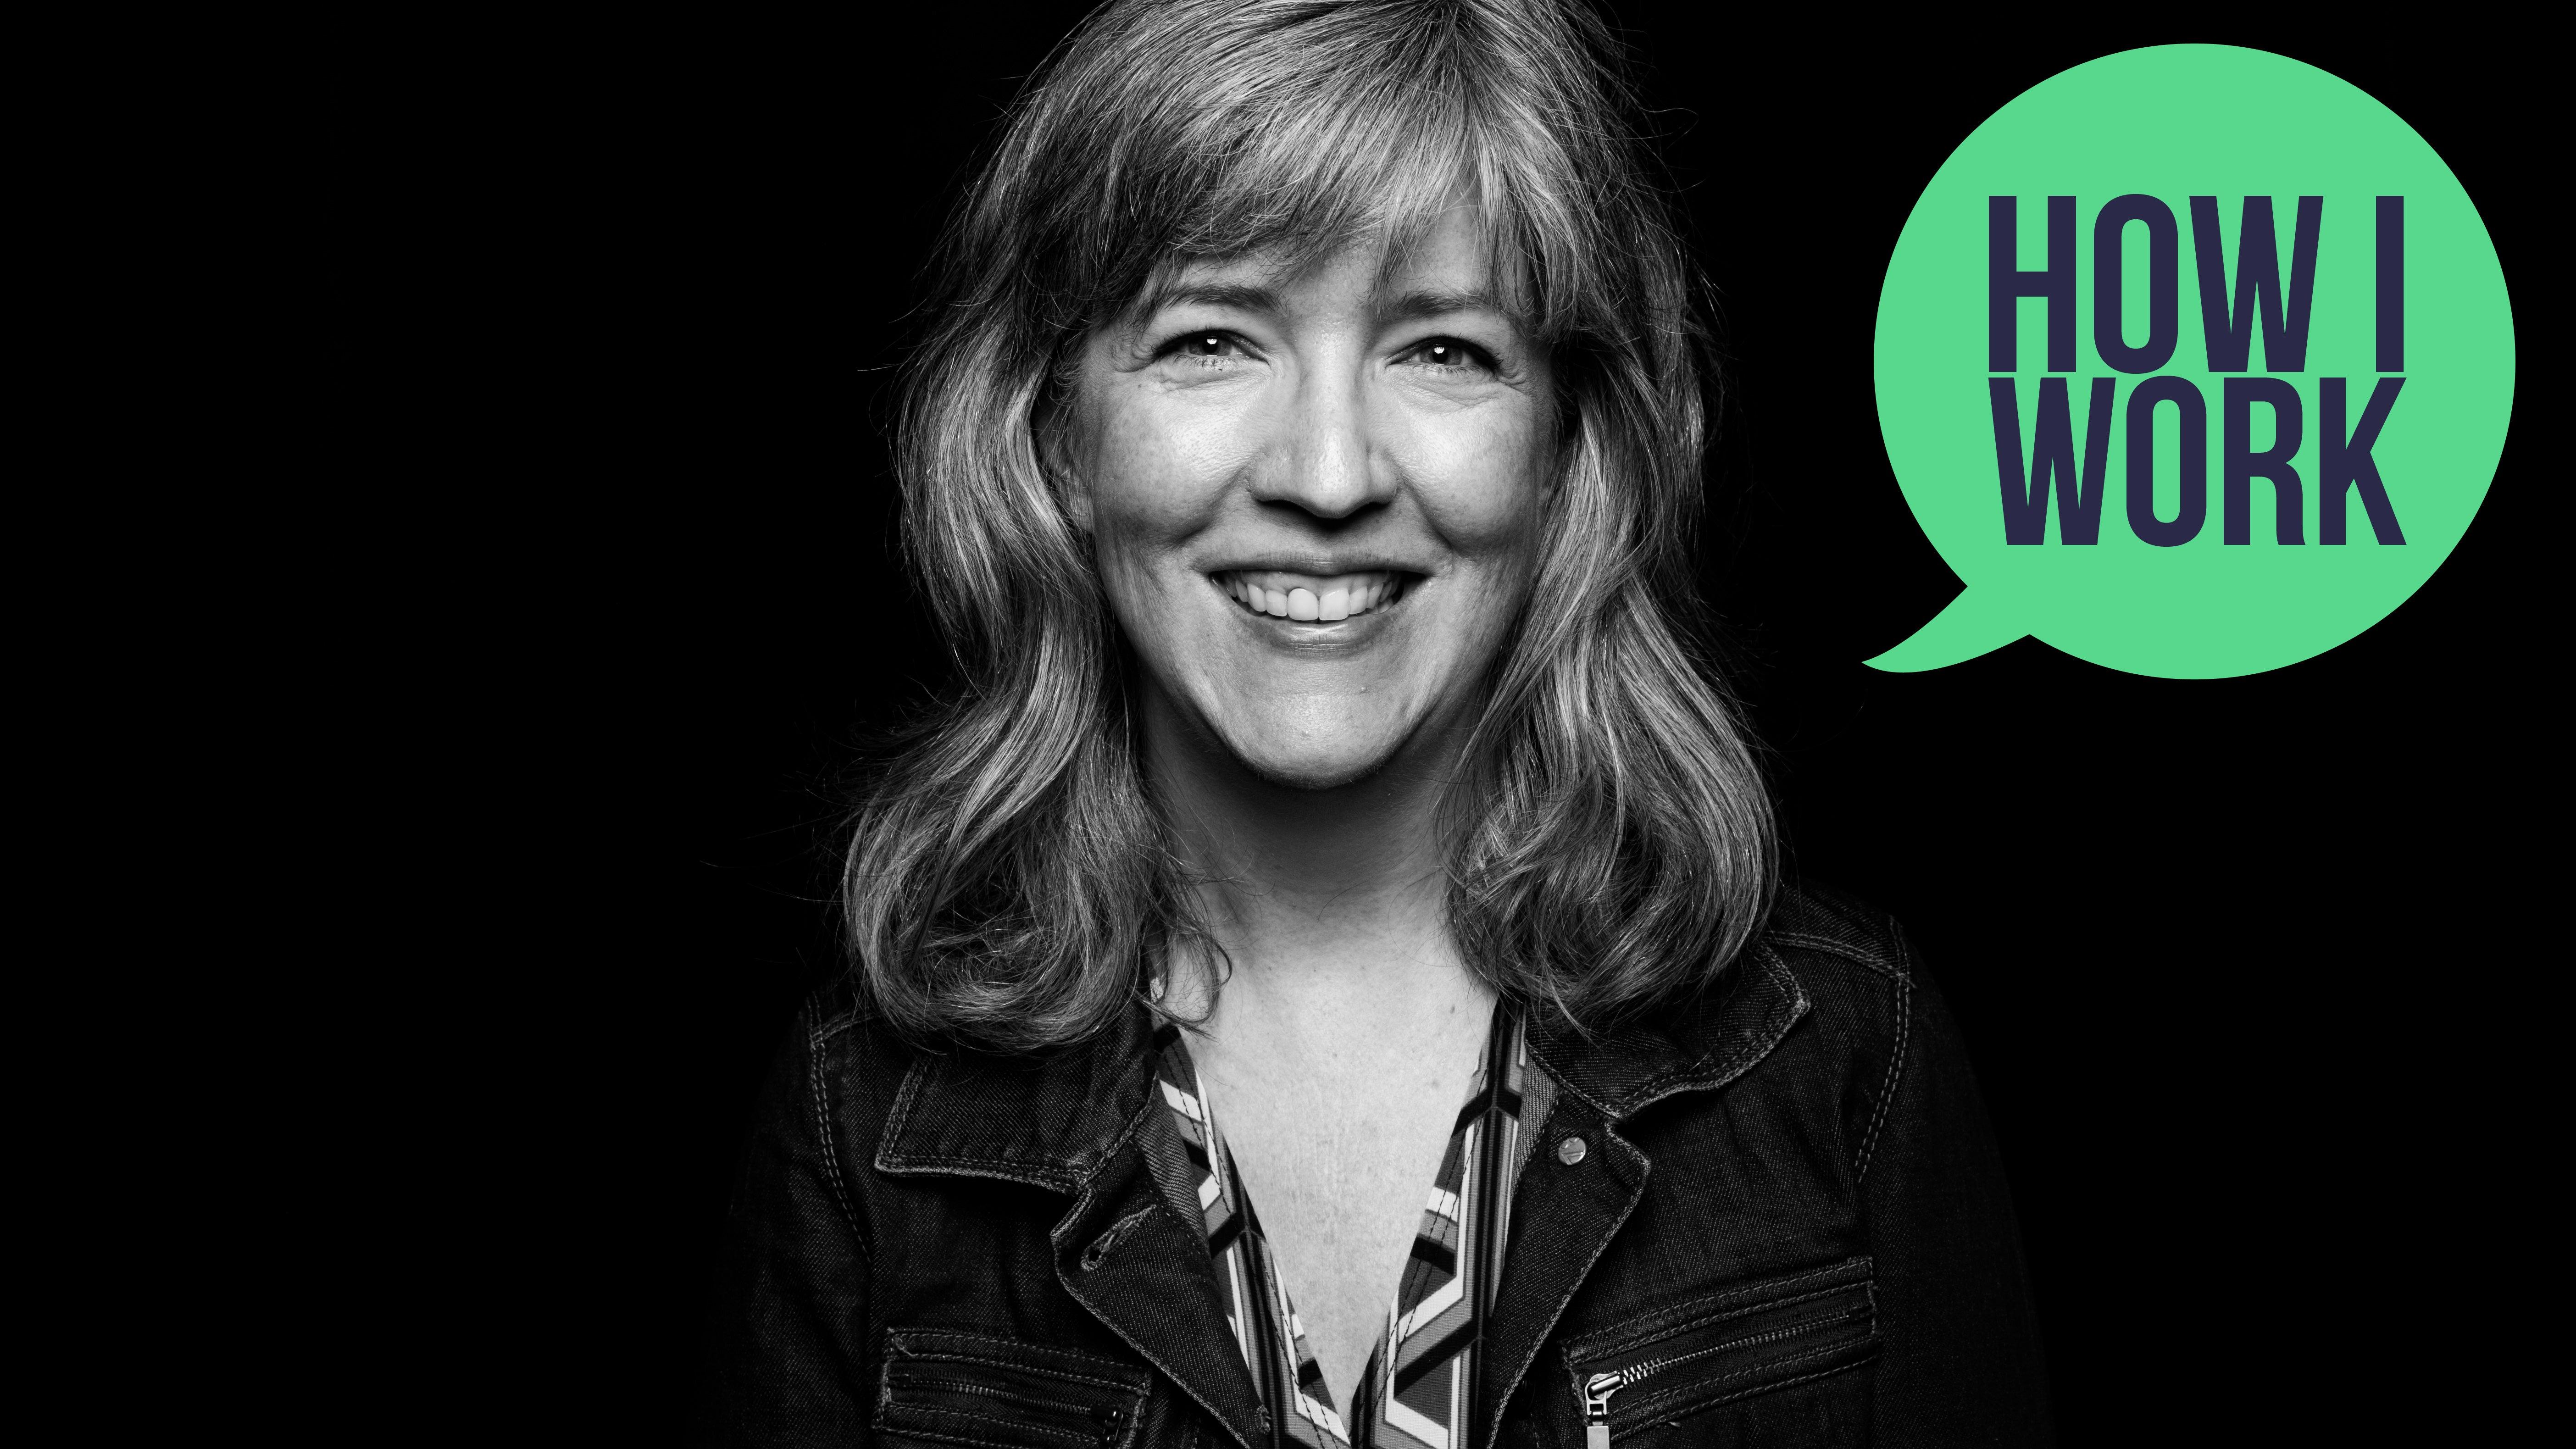 I'm Alice Bradley, Deputy Editor Of Lifehacker, And This Is How I Work